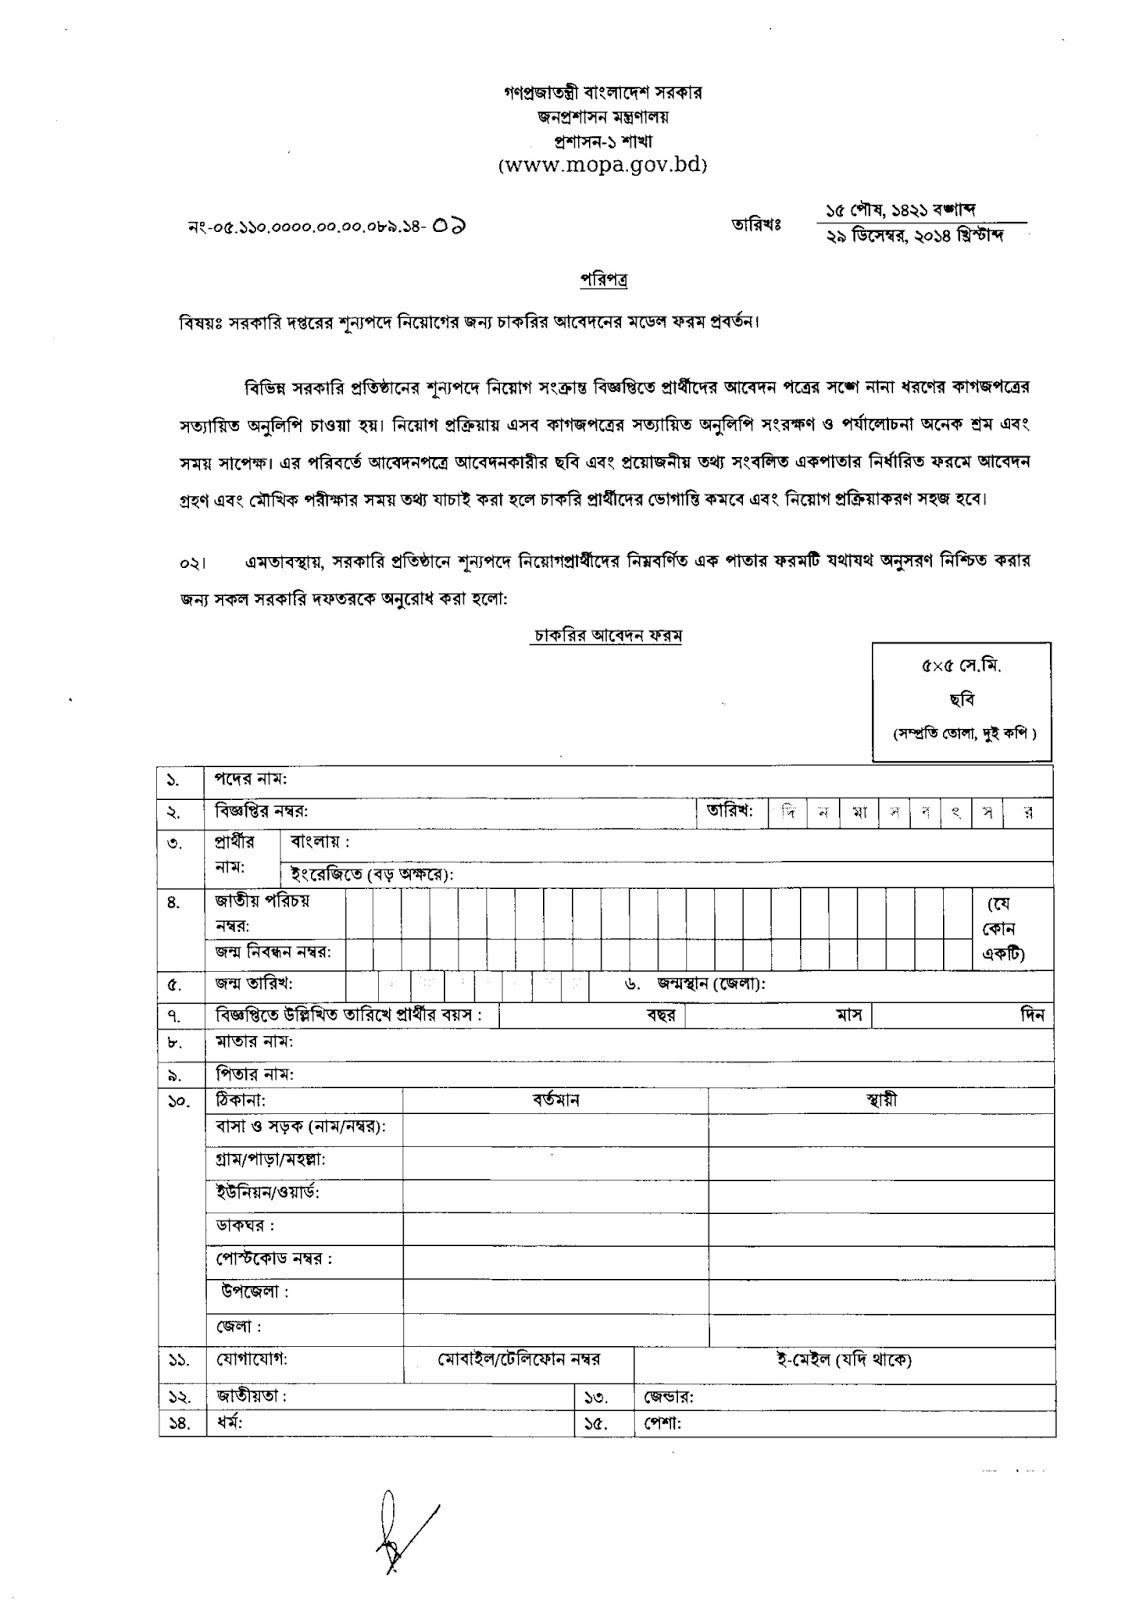 post office job application form